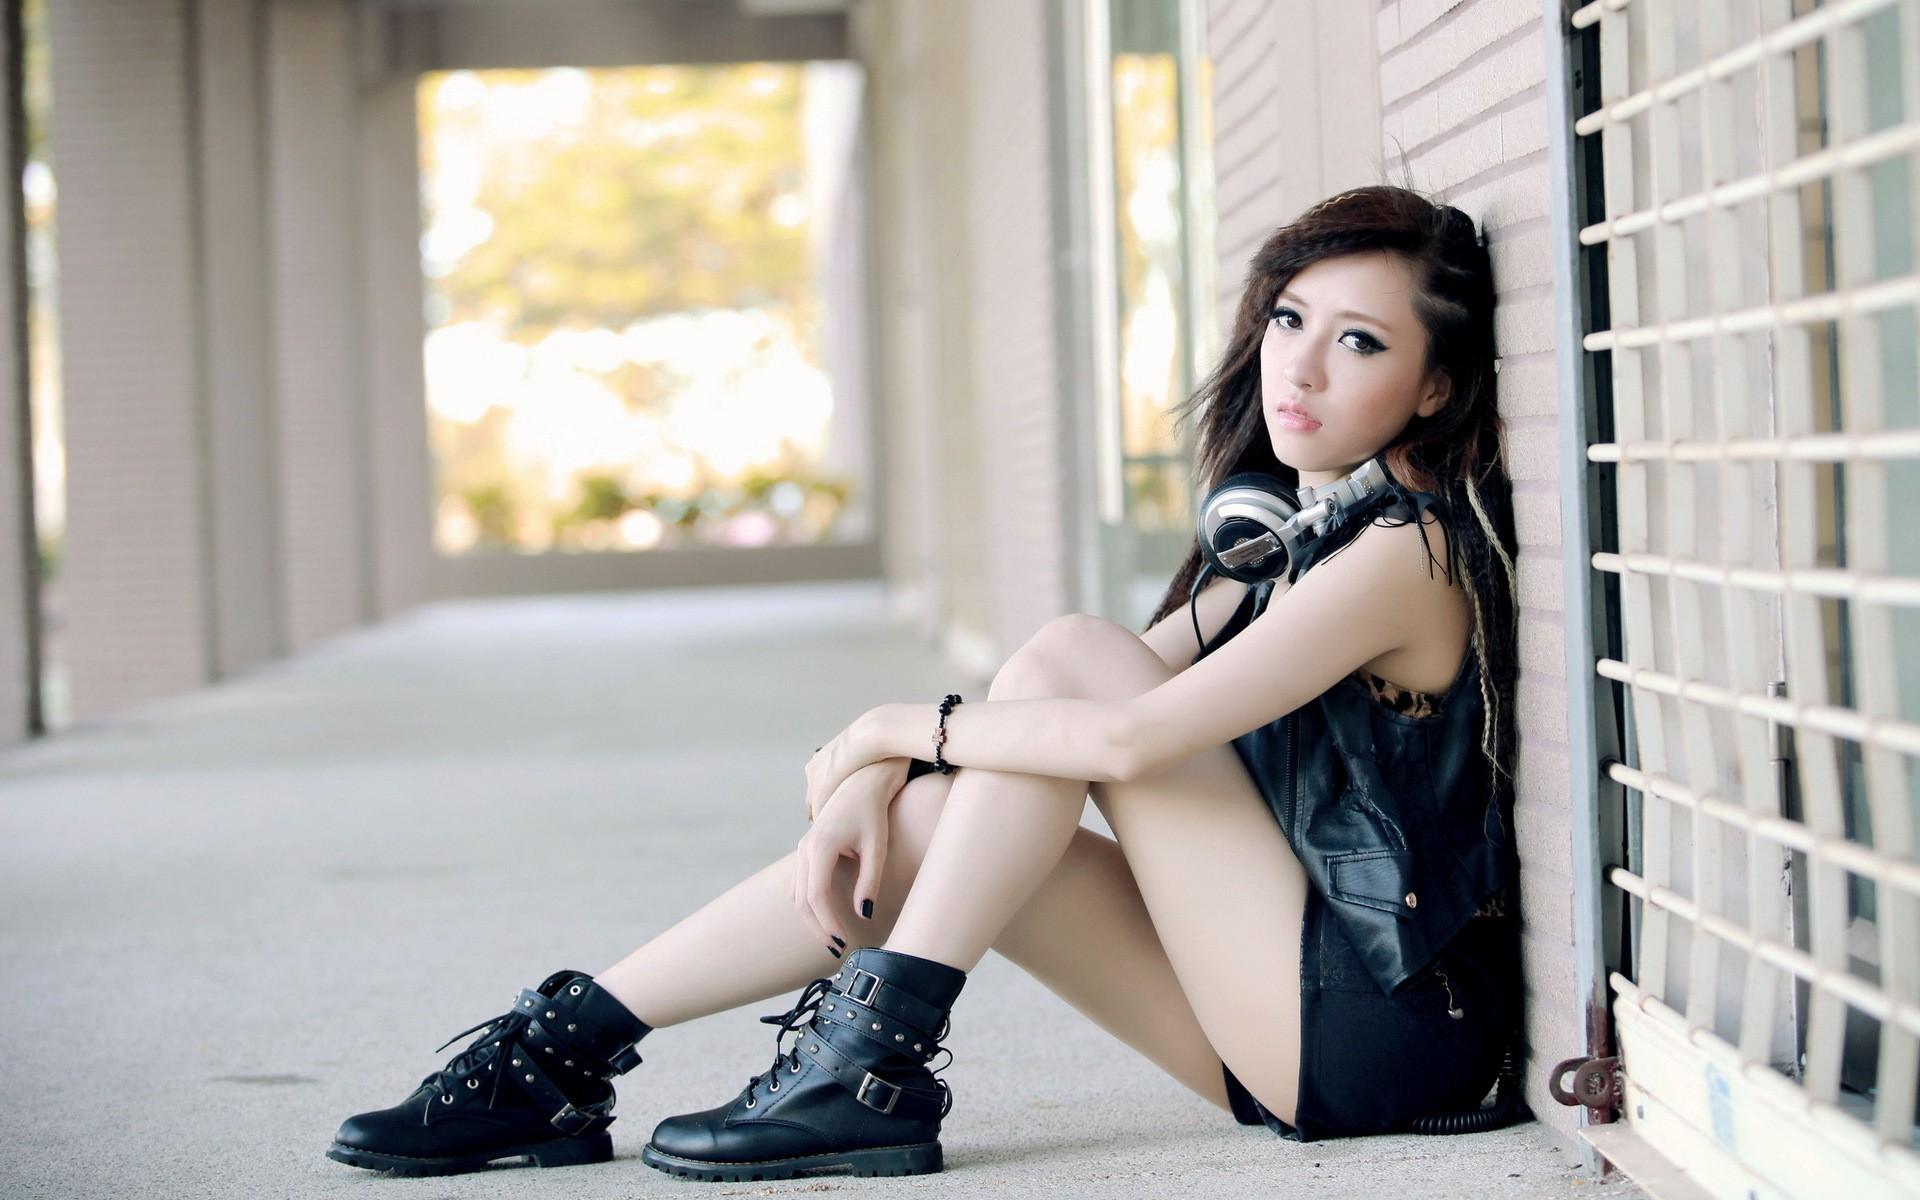 Asian girl dj, hot sexy yong teachers sex with student